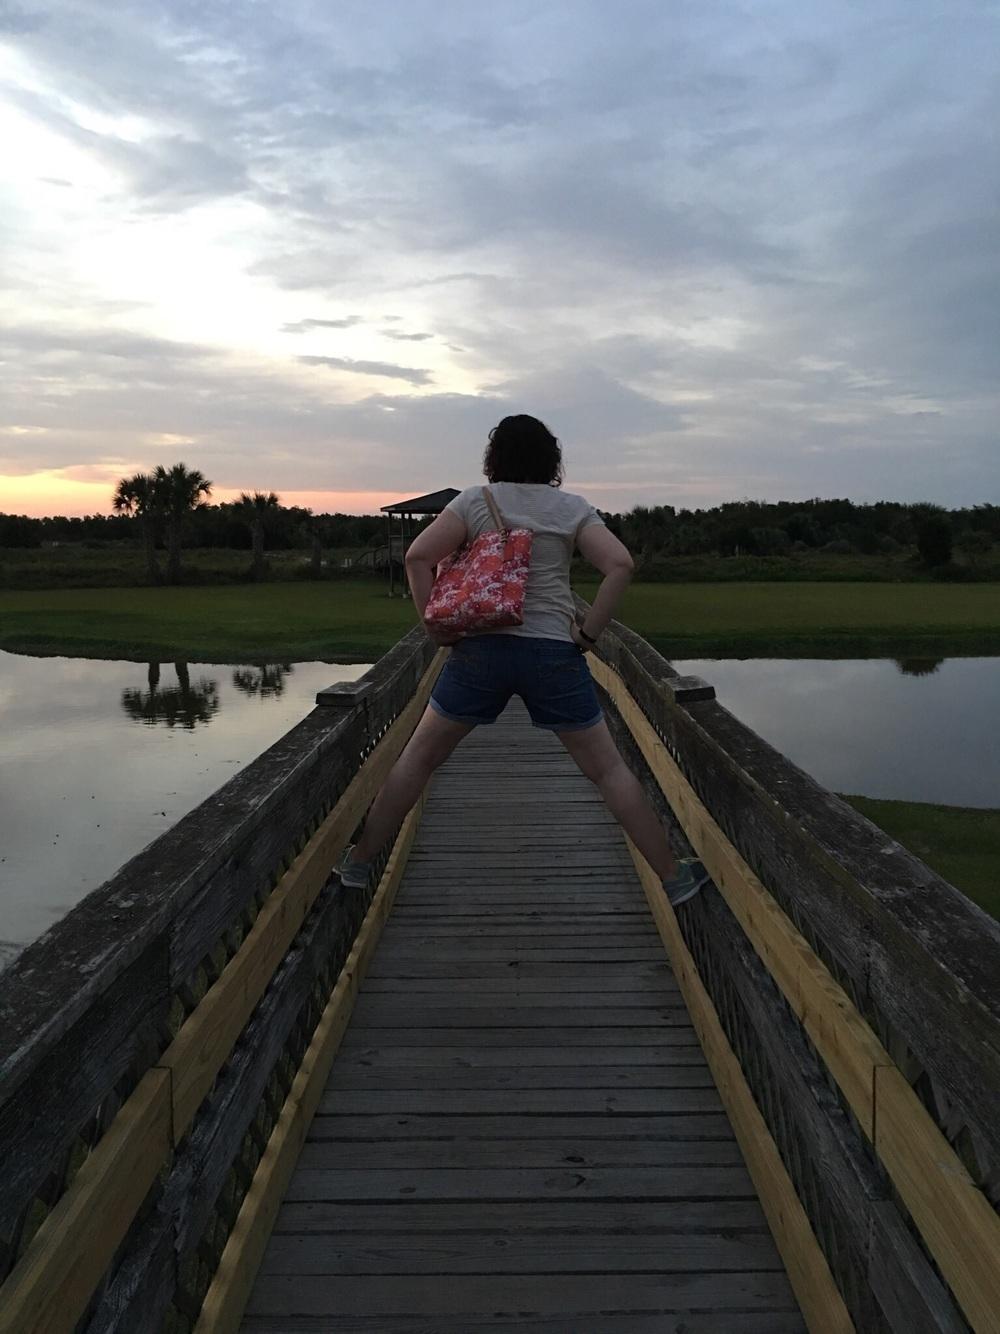 Acting a fool on a bridge